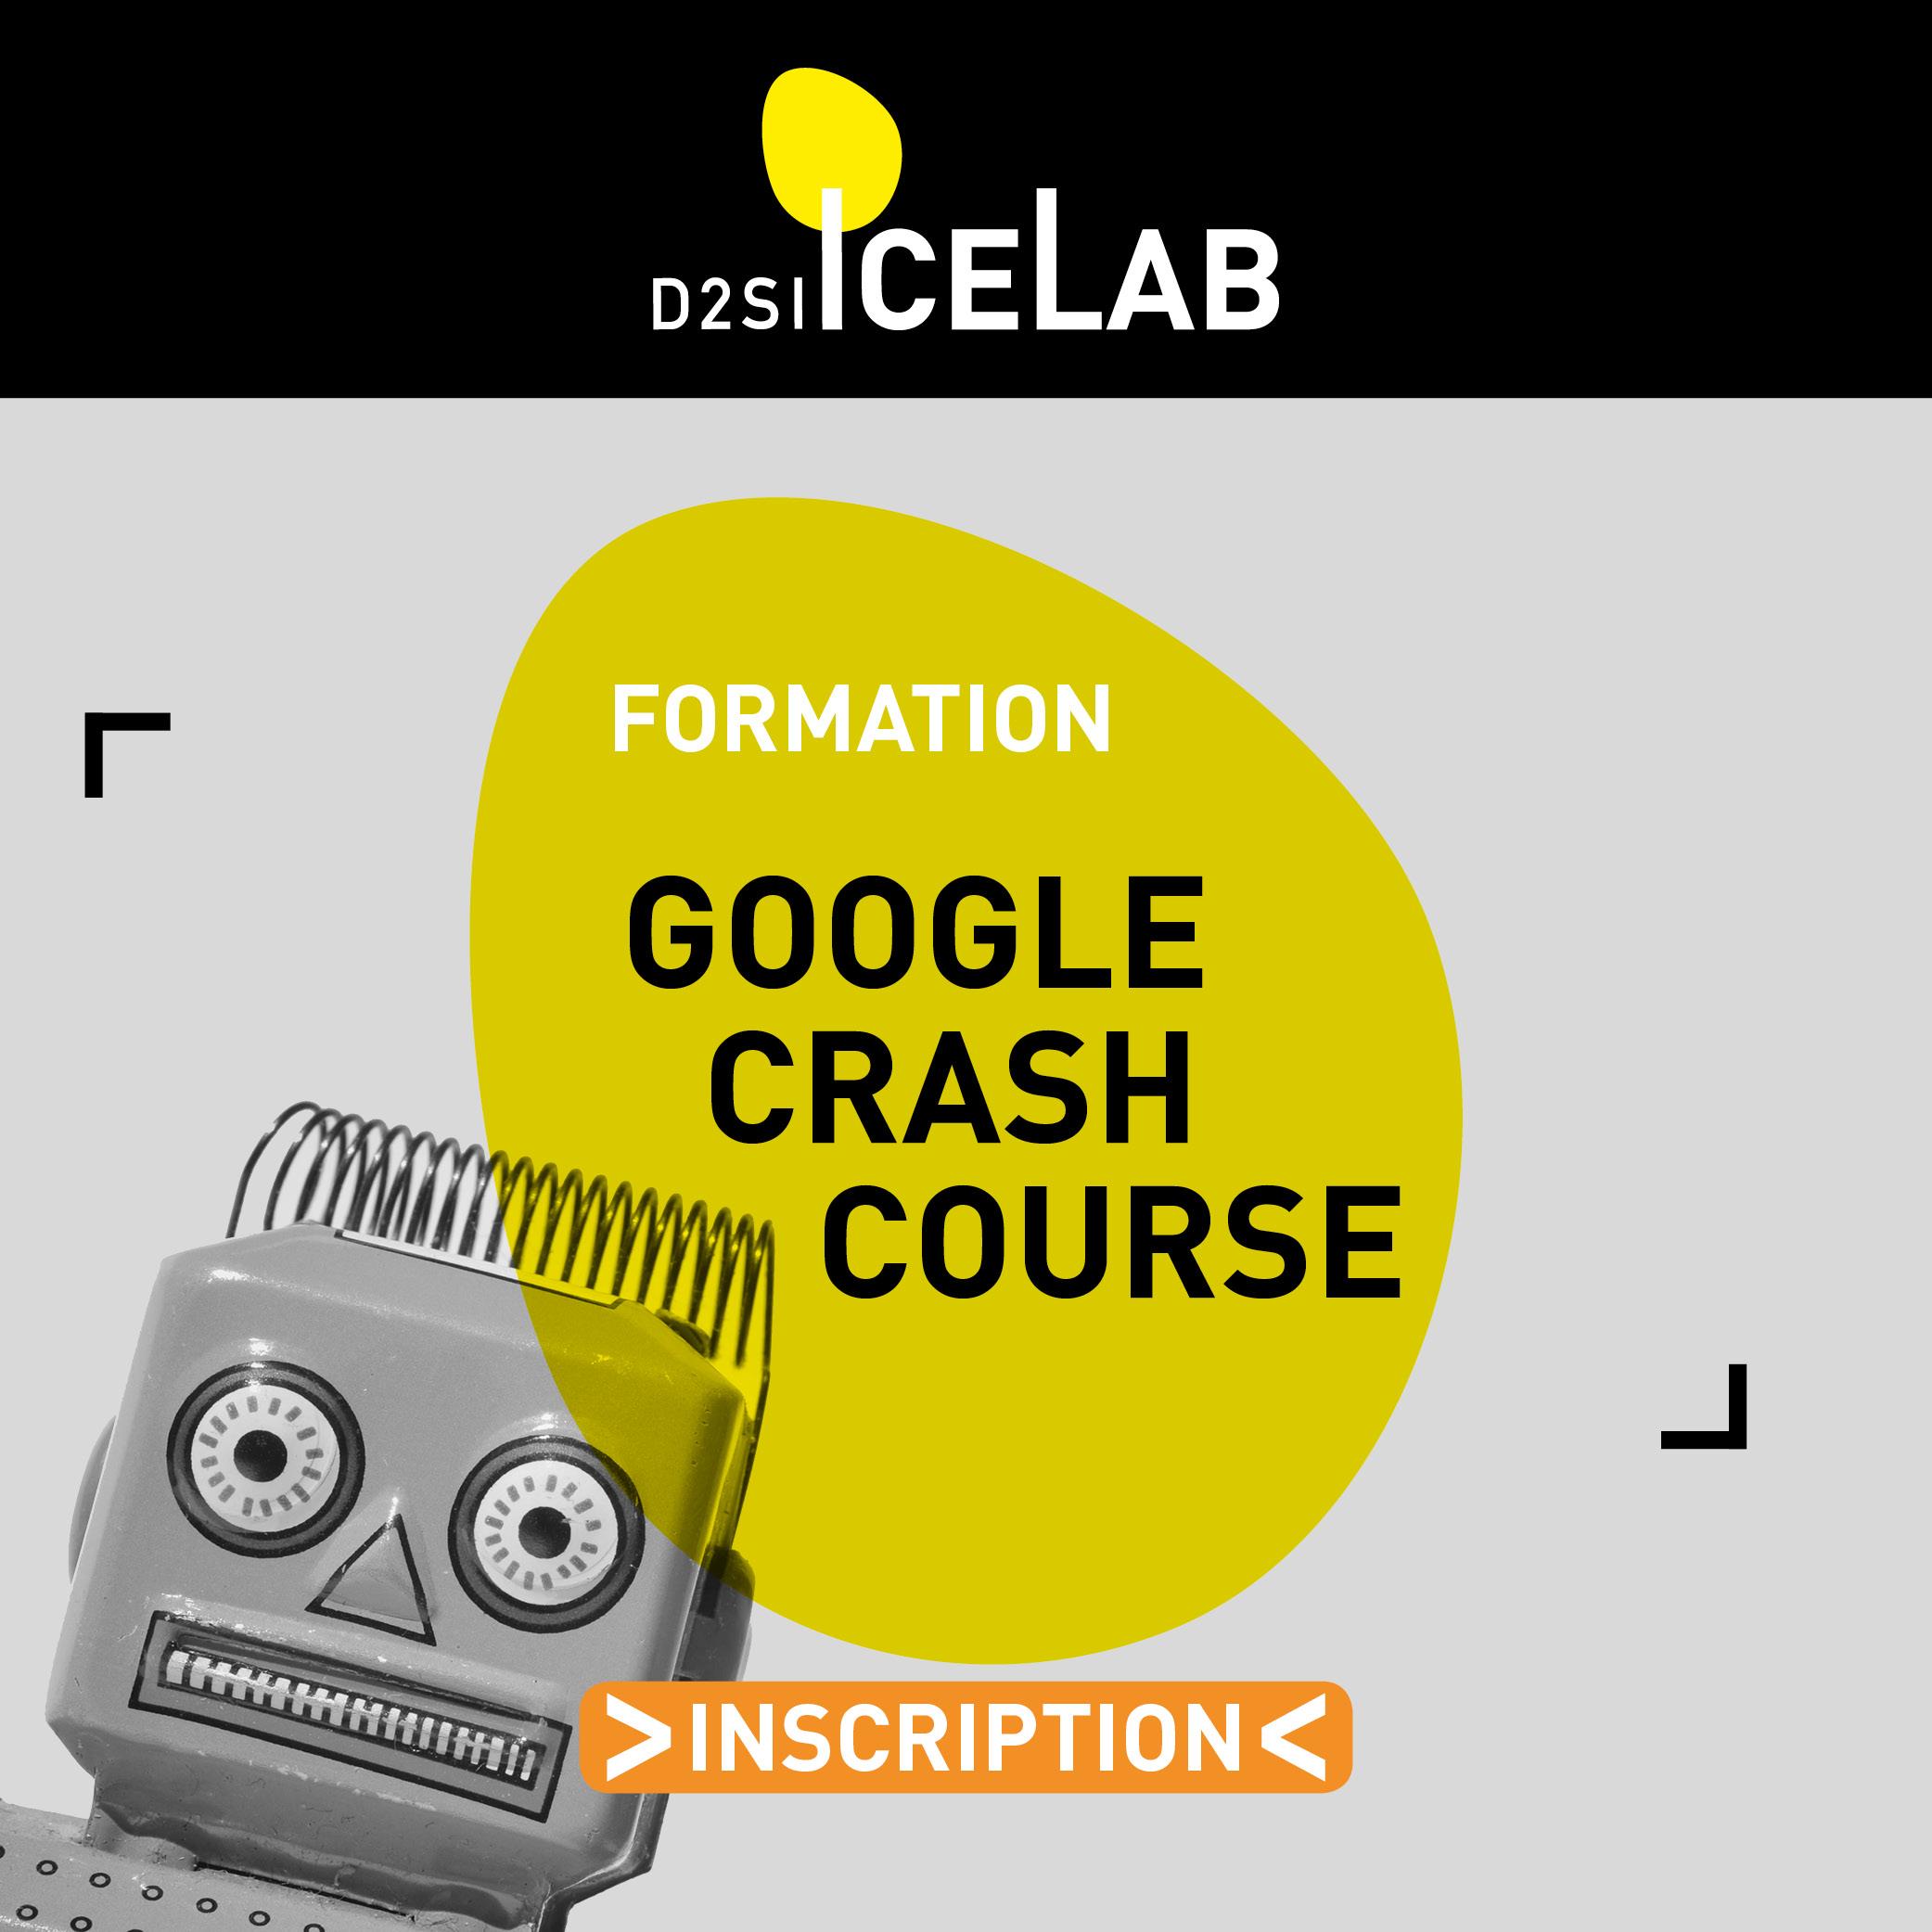 Google crash course ICELAB